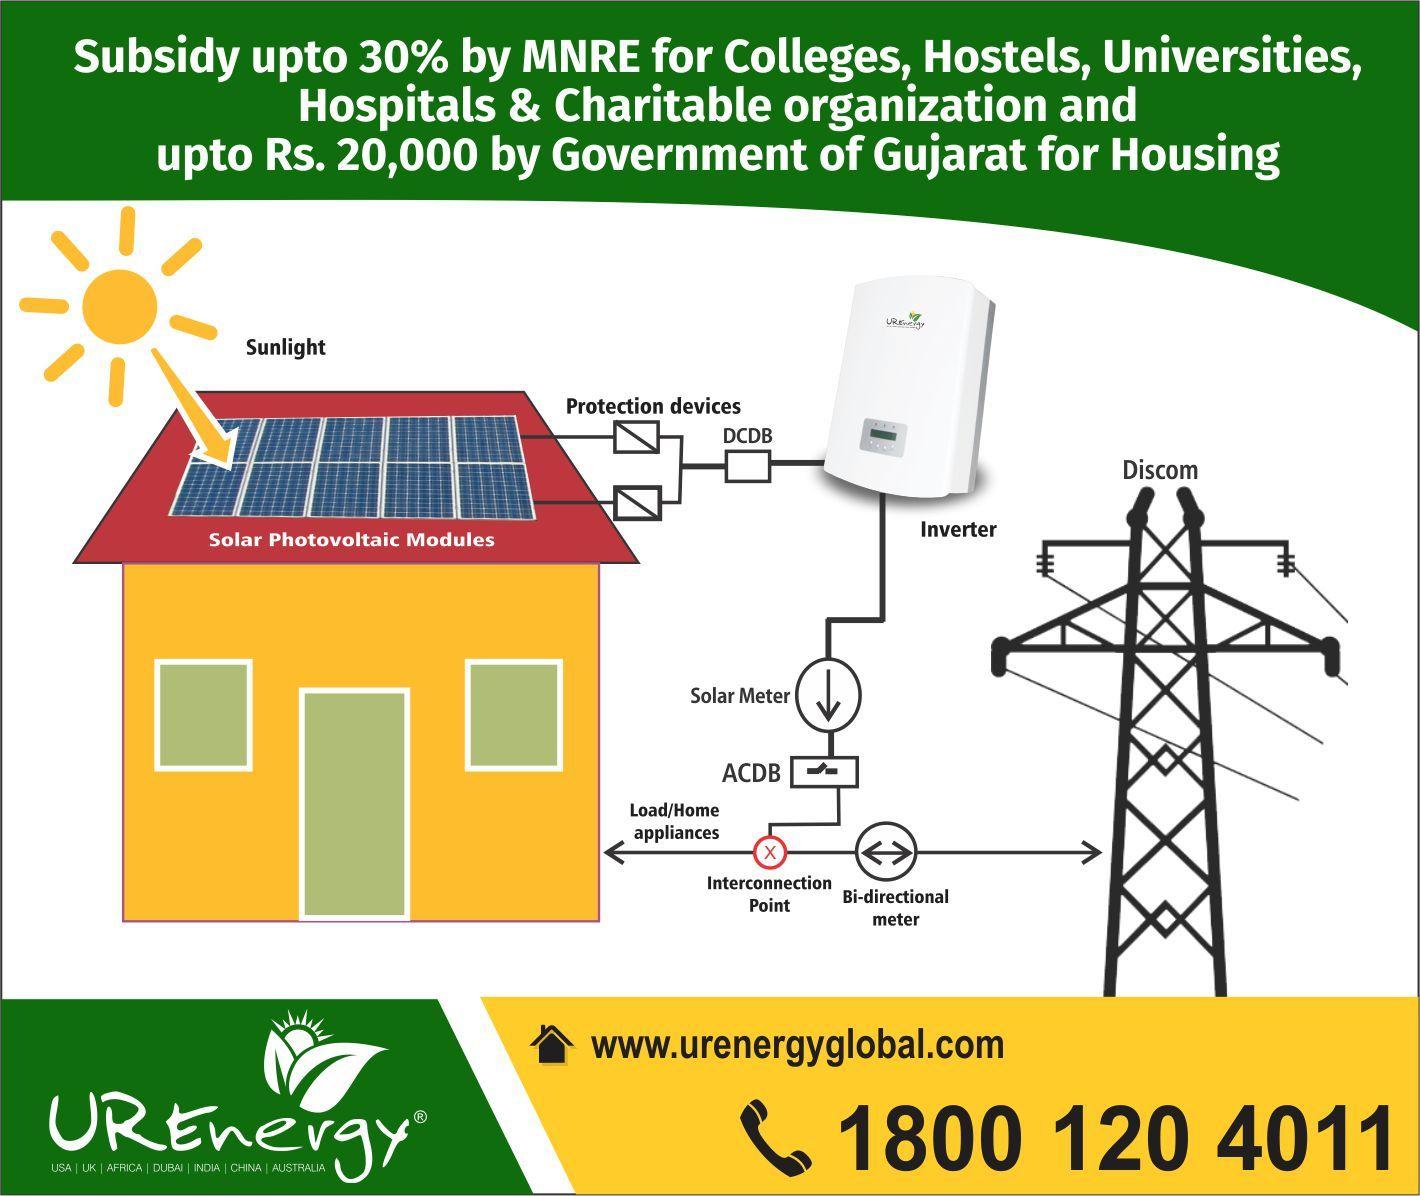 Solar Power Panel Inverters Irrigation Pumps Street